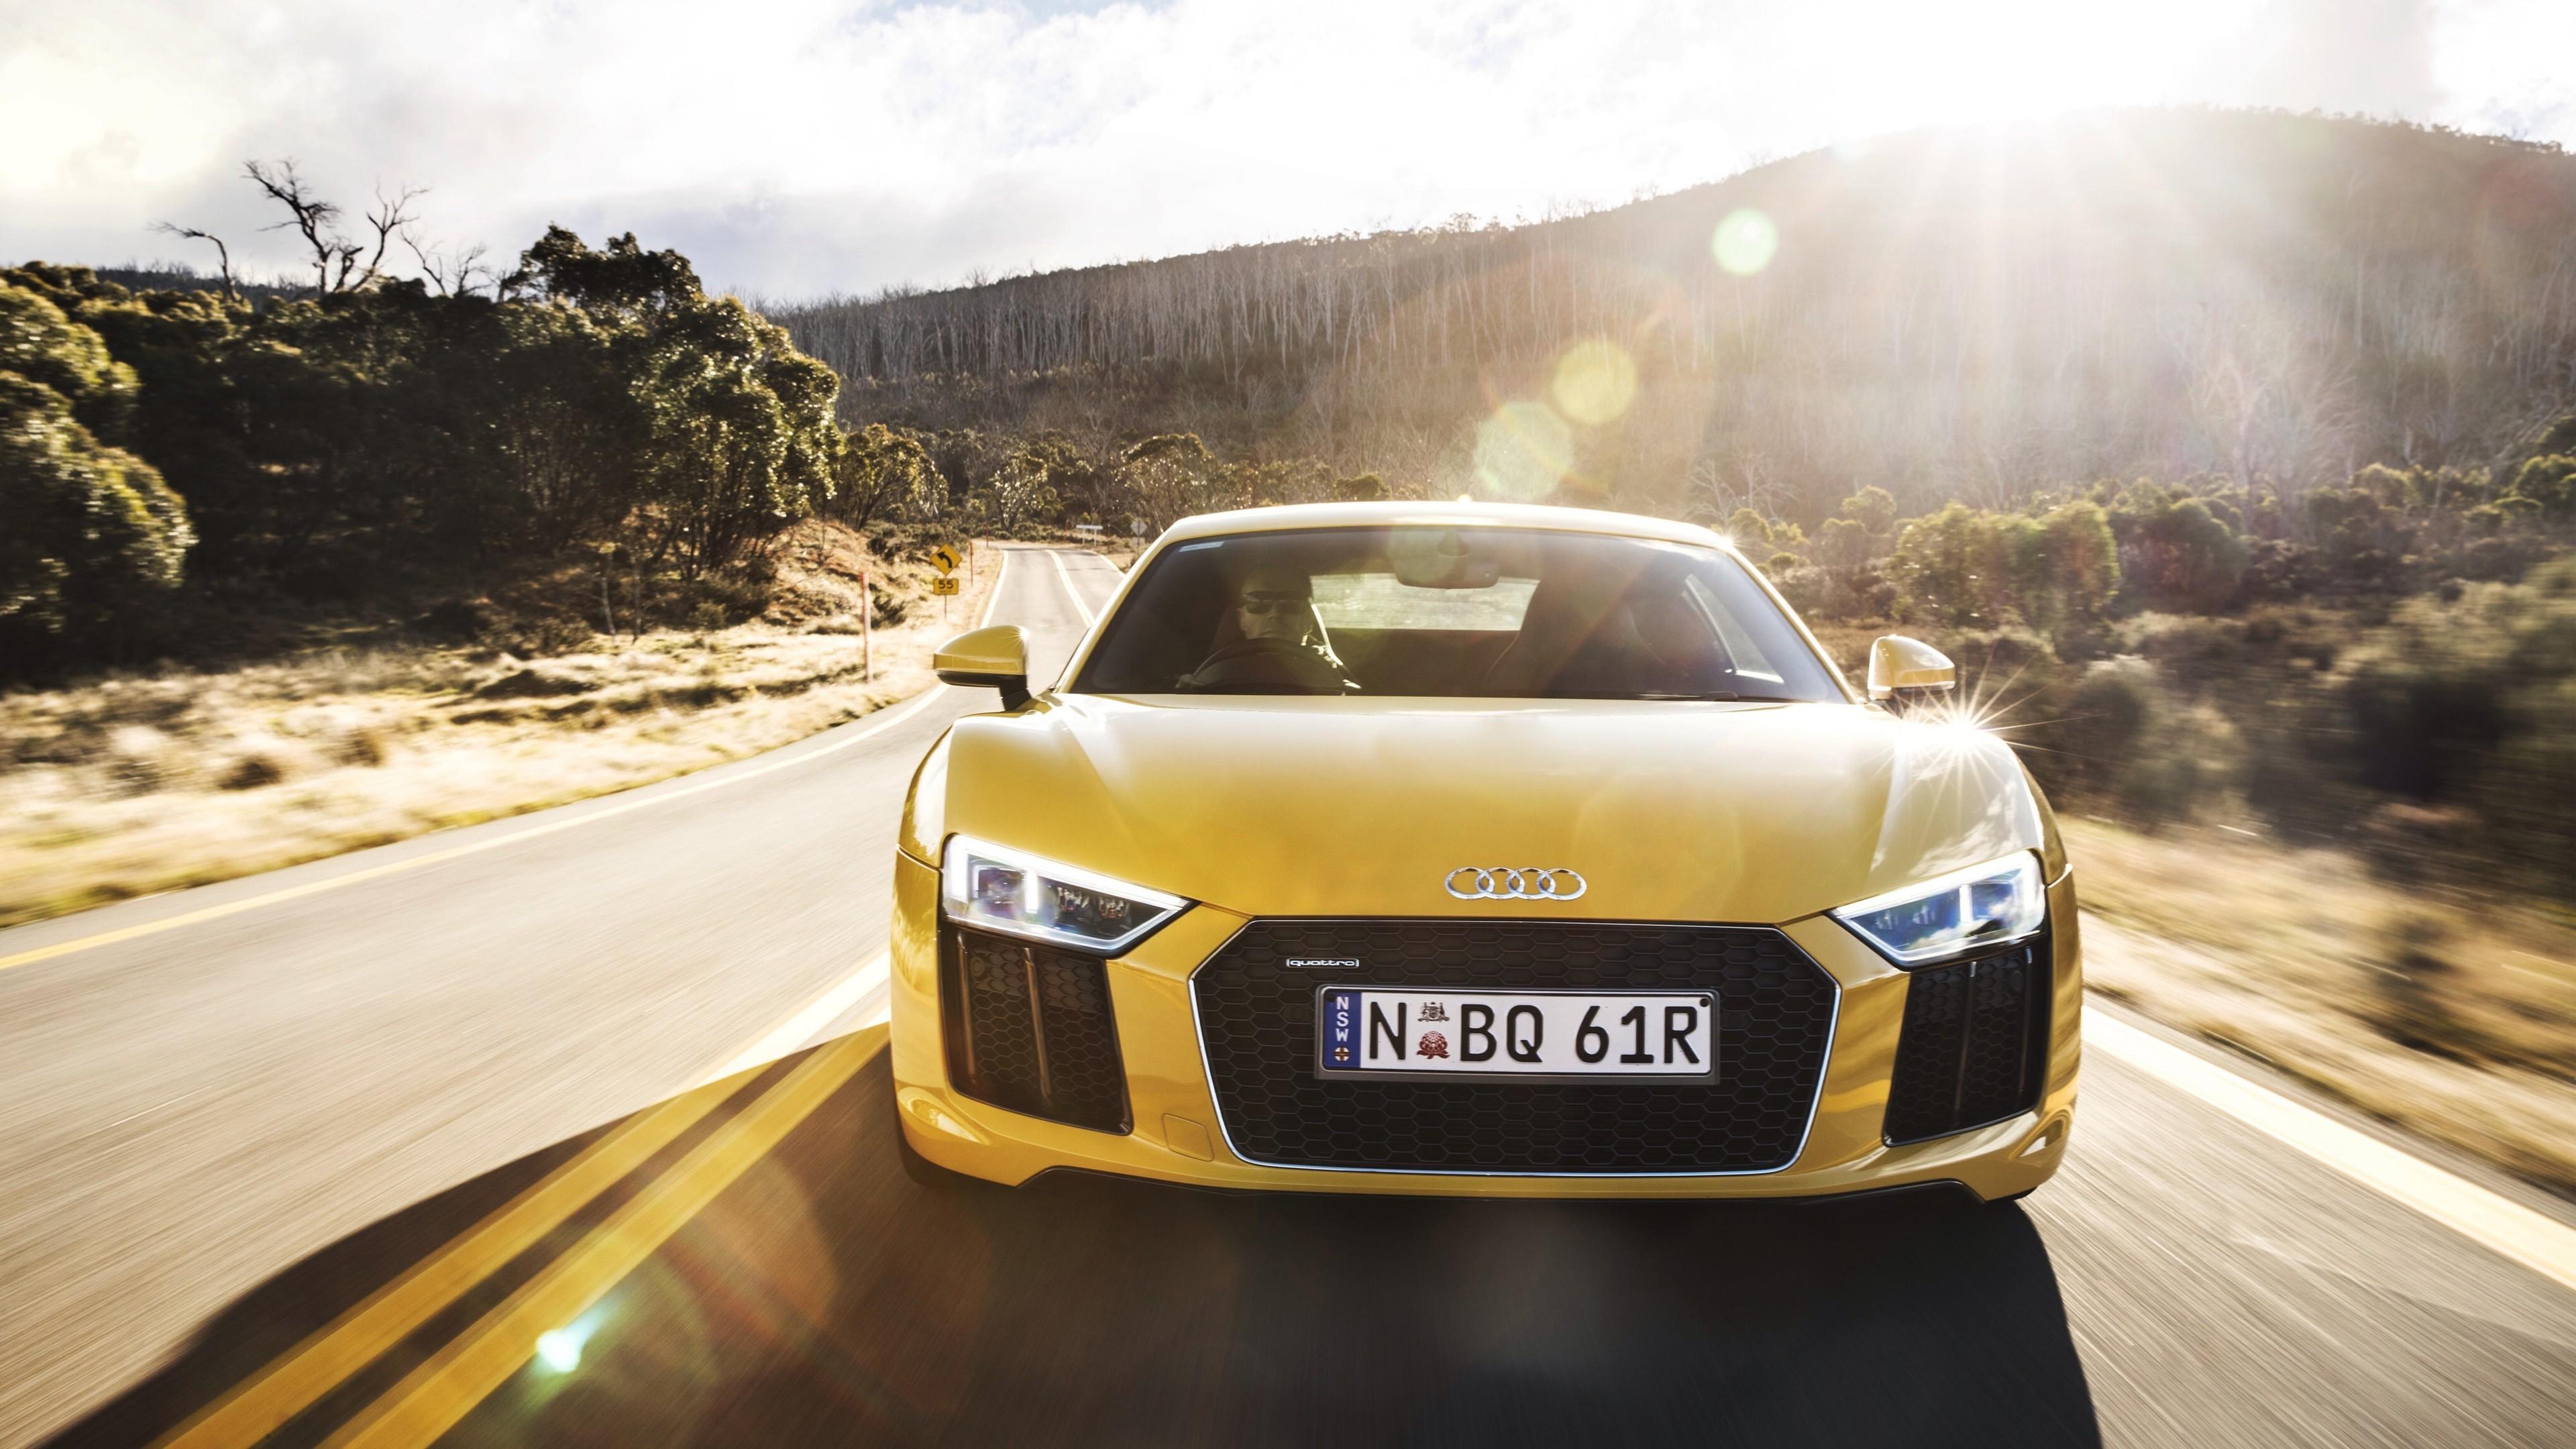 Audi R8 Hd Widescreen Wallpapers 1080p Audi R8 2016 Wallpaper Hd Car Wallpapers Id 6810